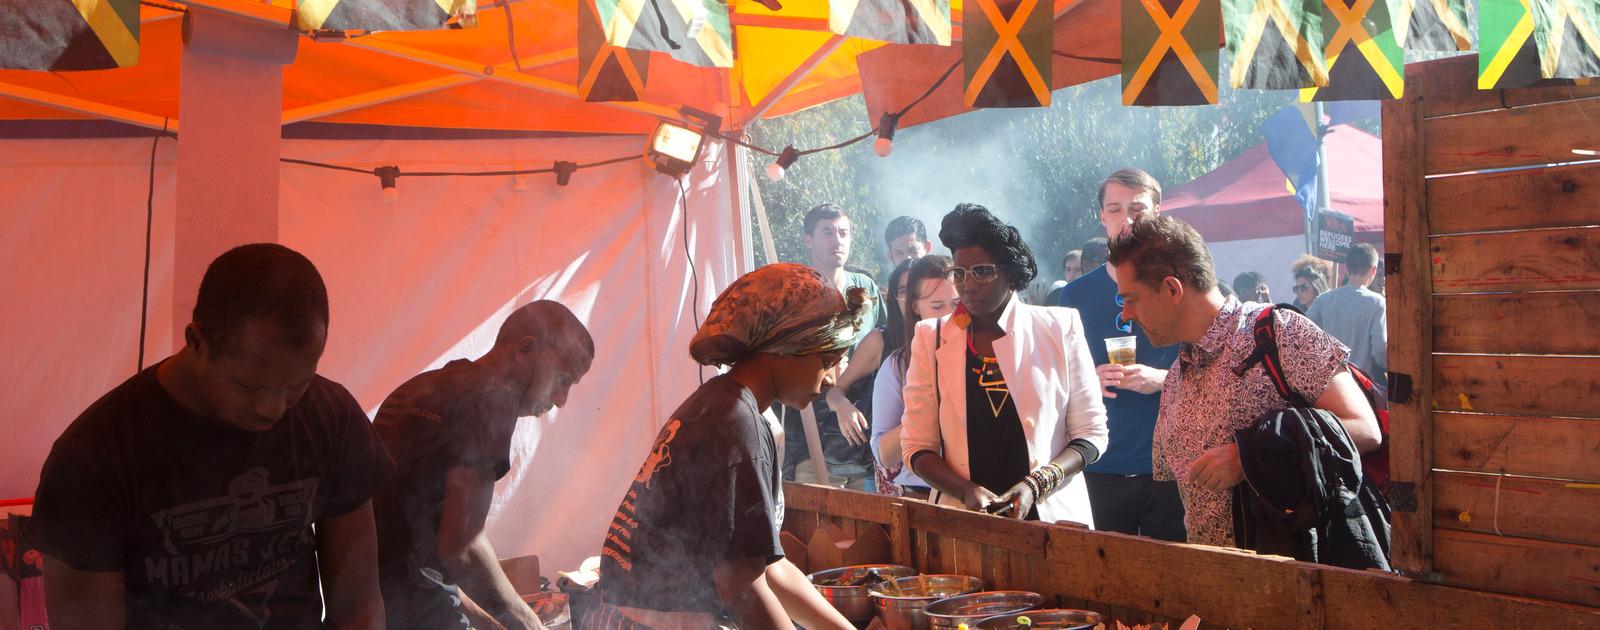 Market vendors at the Africa Utopia Market, Southbank Centre